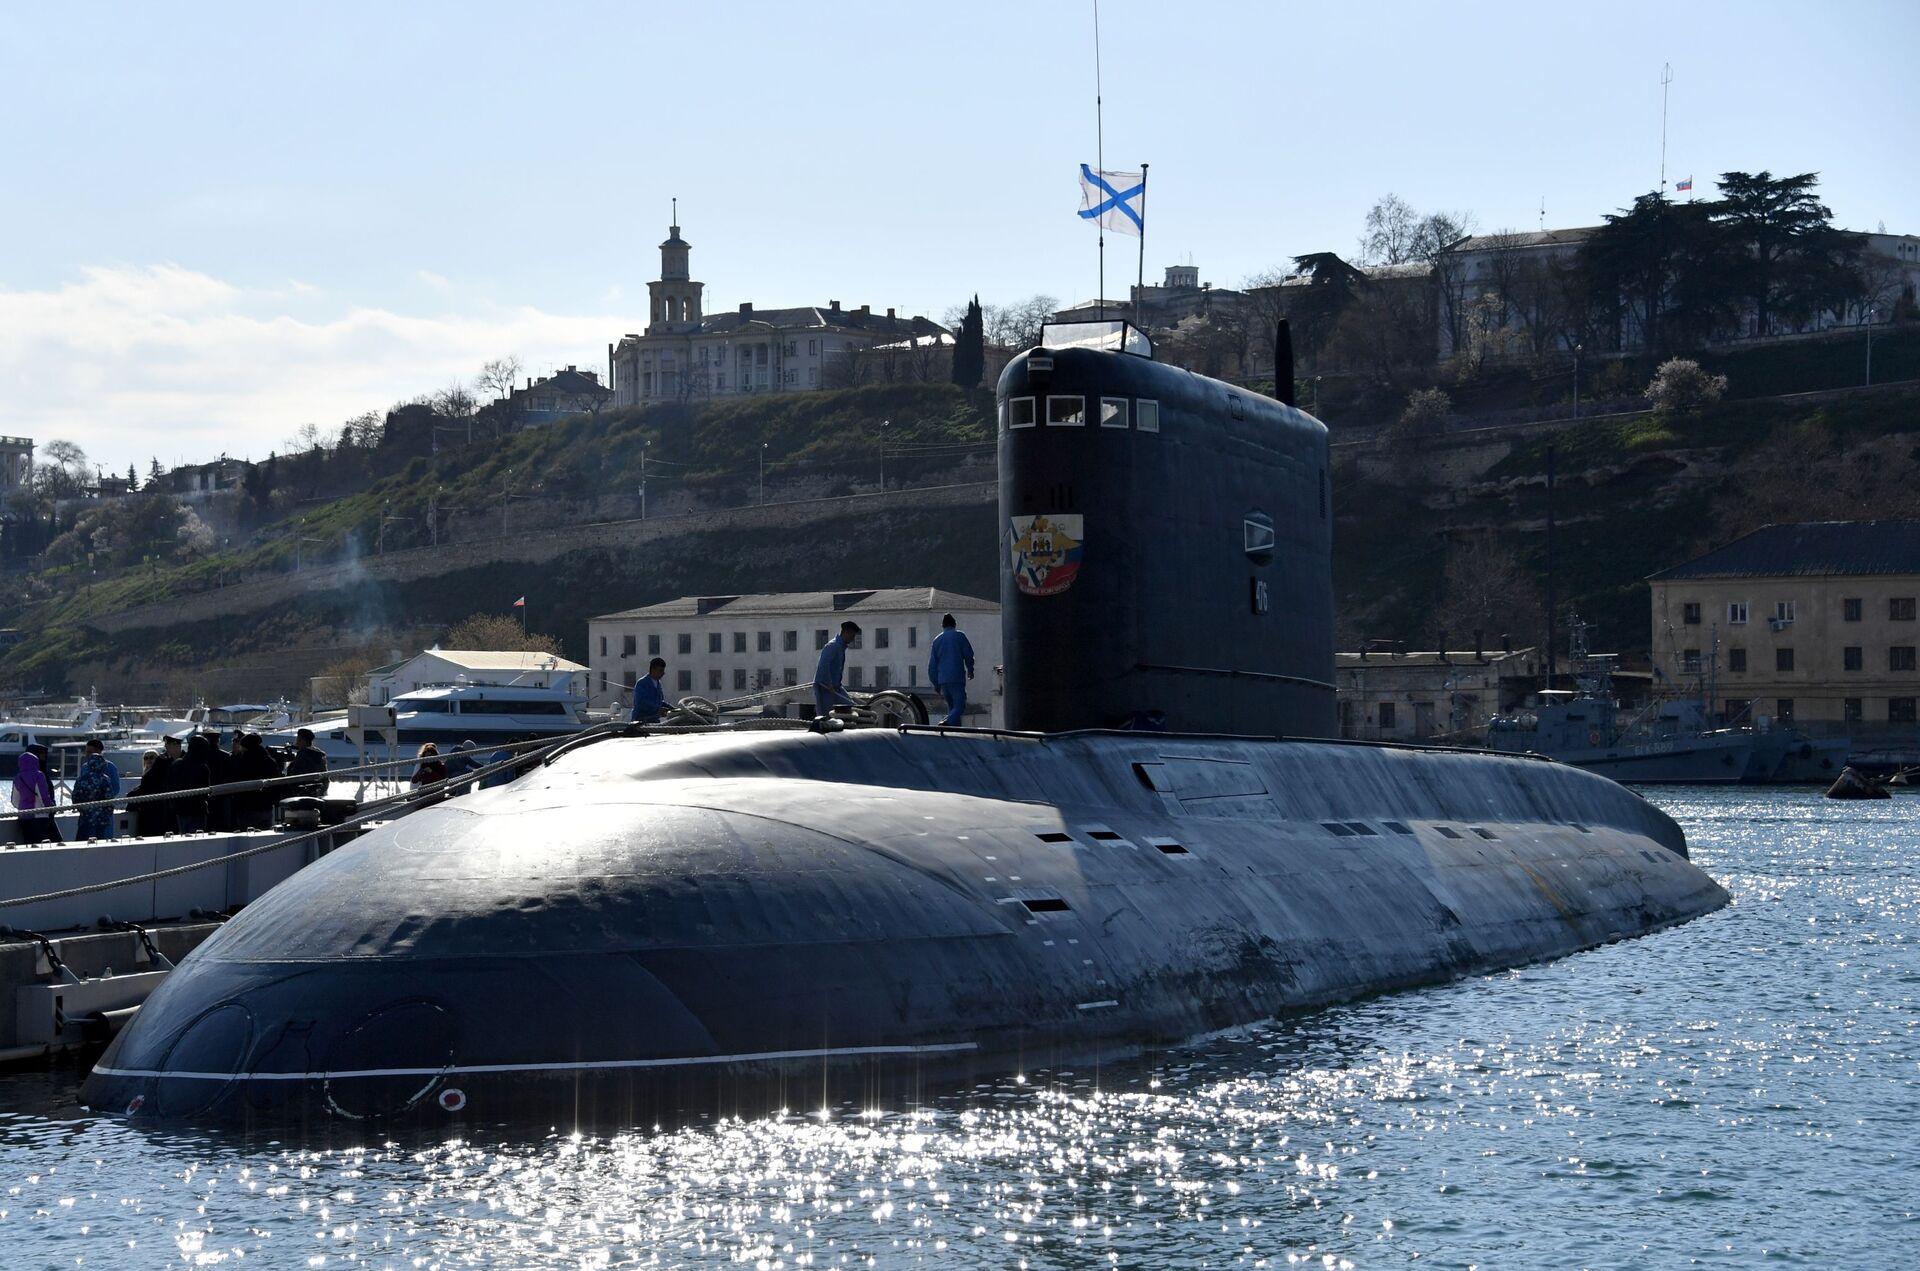 Sottomarino Veliky Novgorod - Sputnik Italia, 1920, 18.05.2021